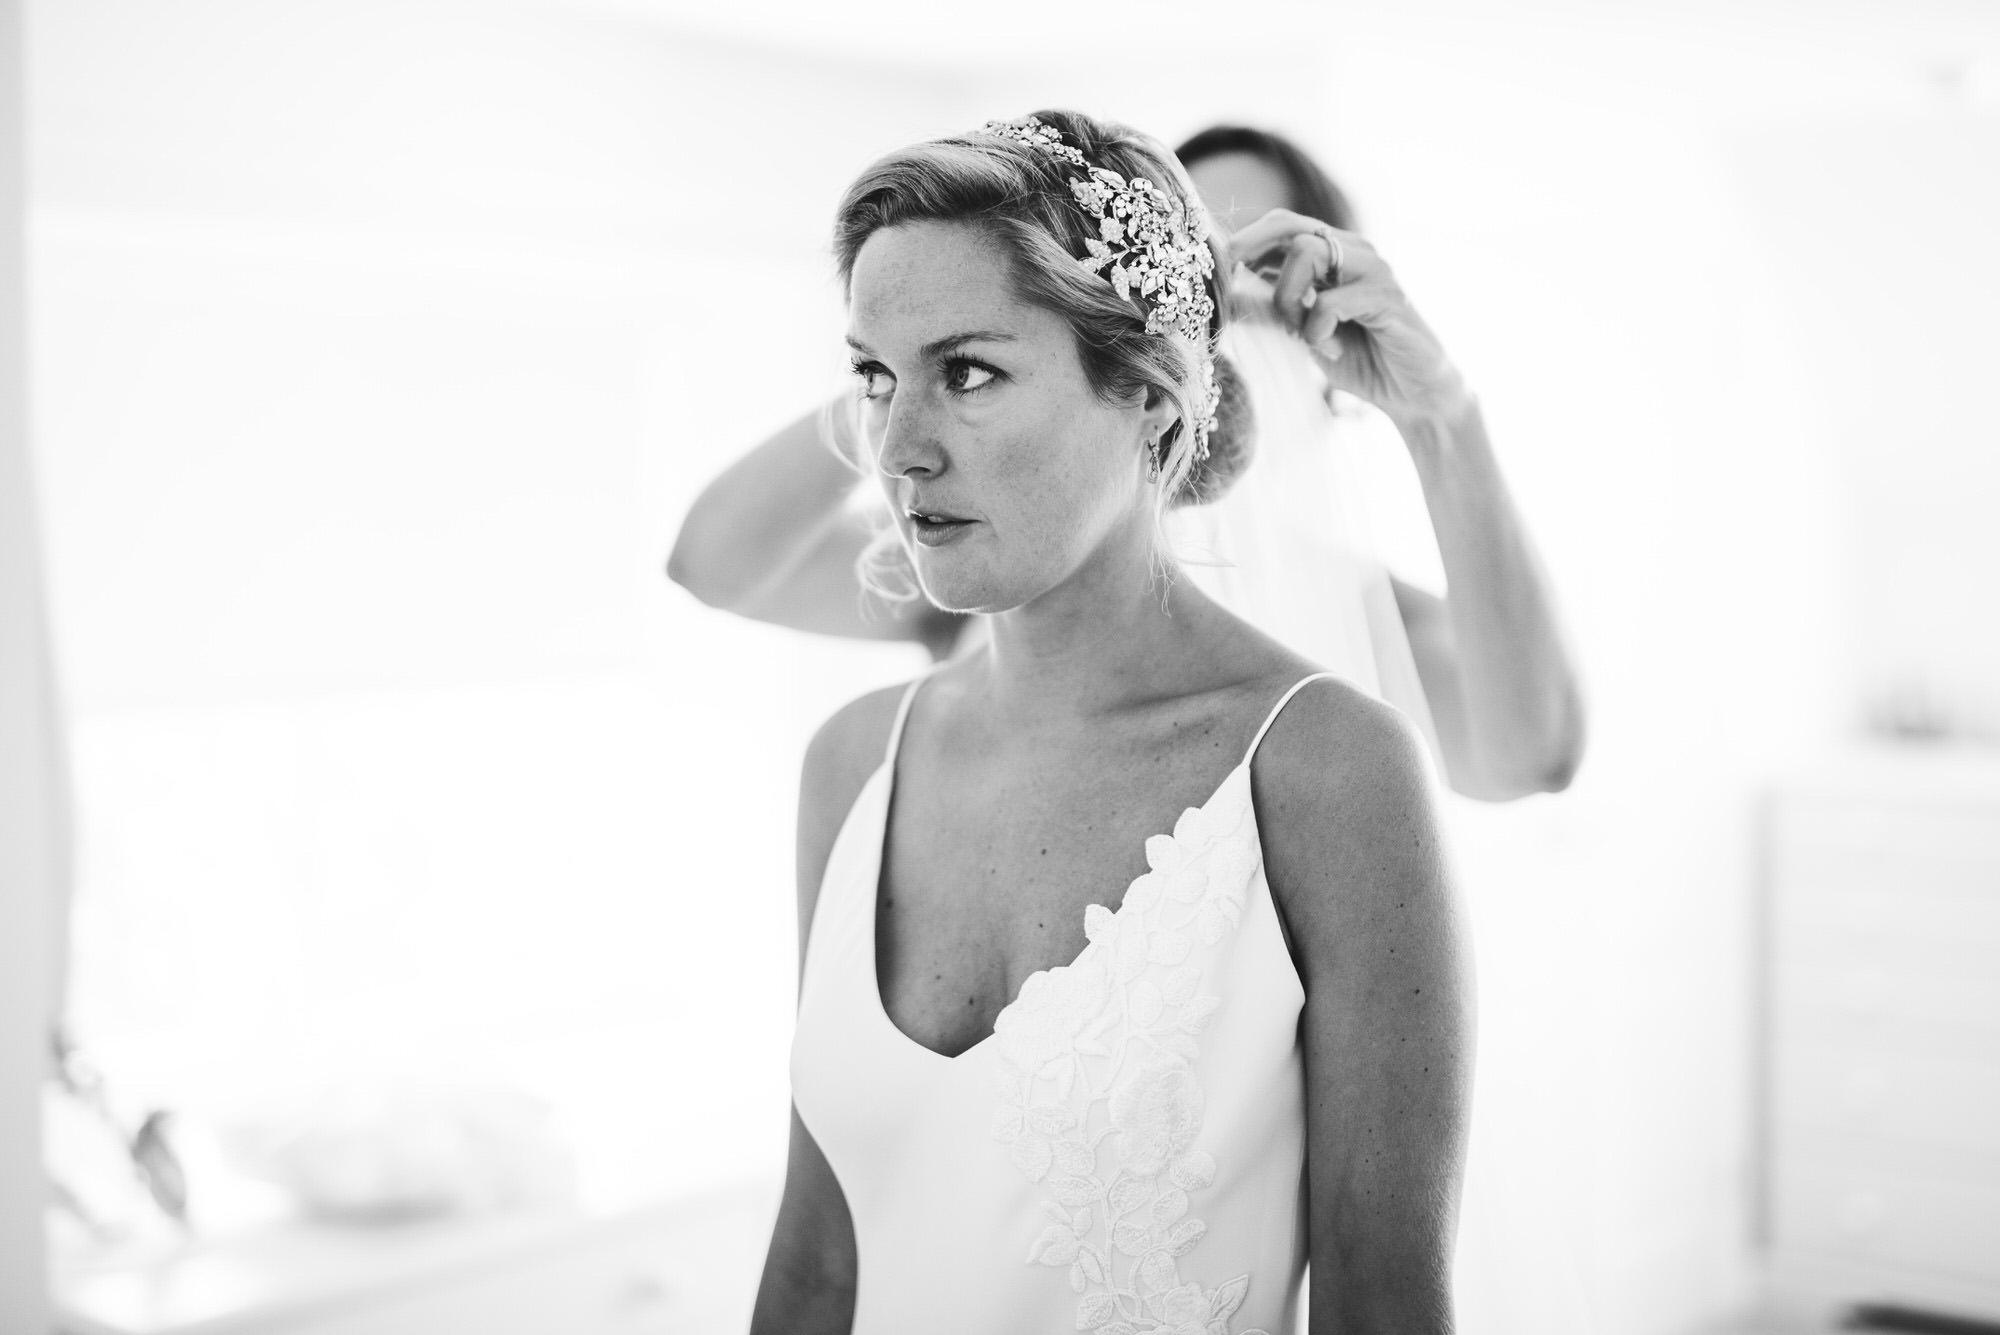 Dorset marquee wedding by the sea simon biffen photography 6